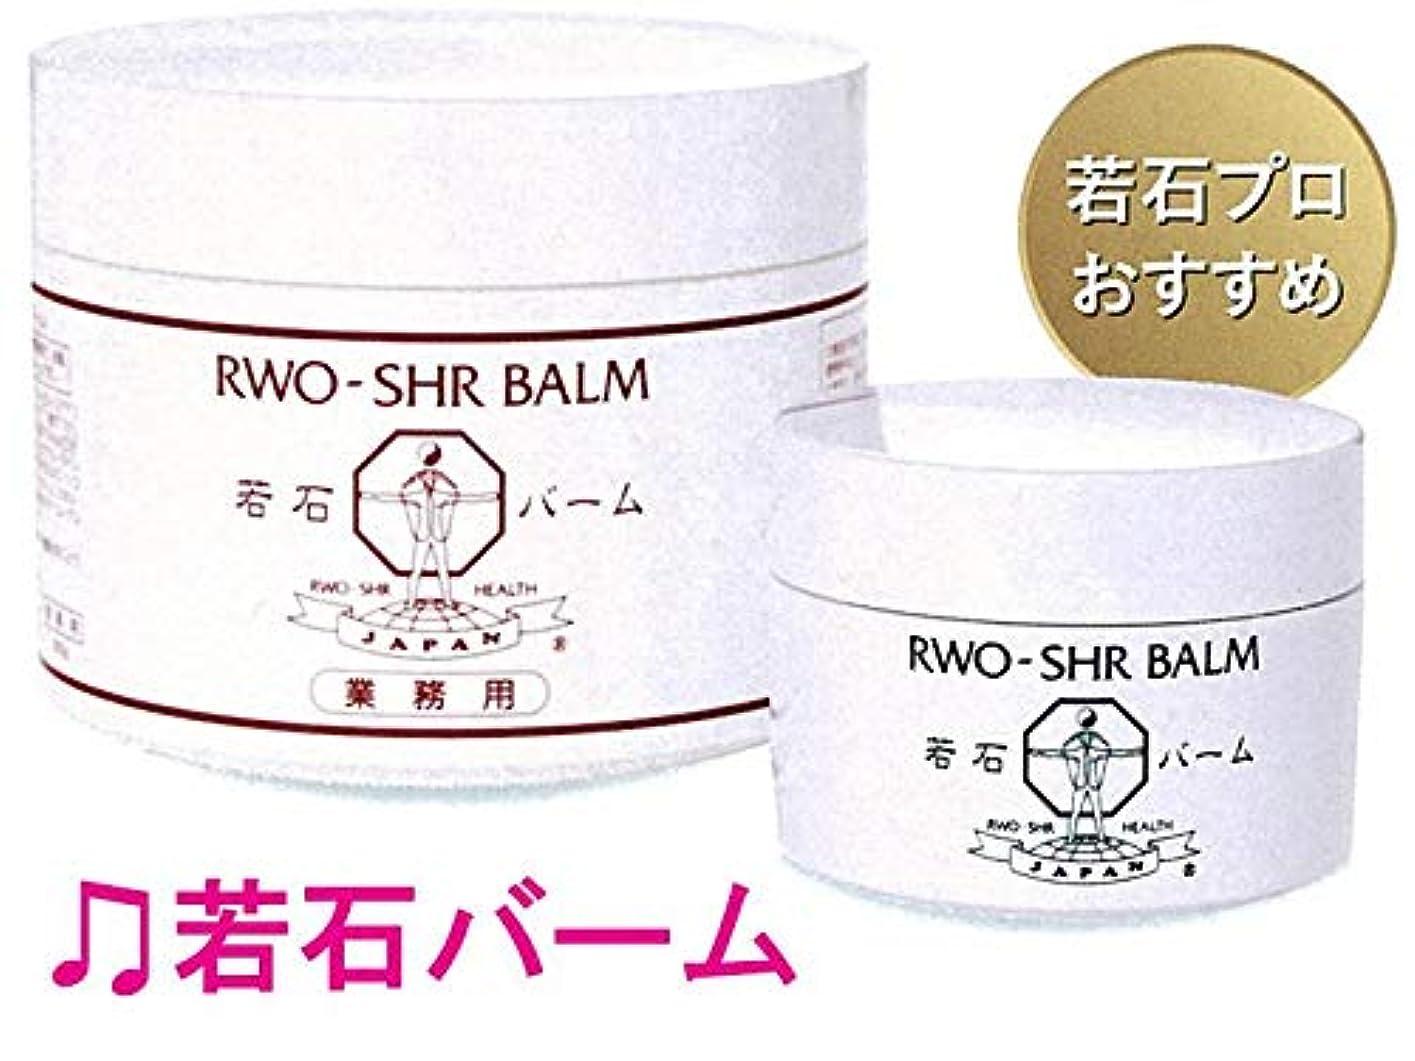 戸口ご予約不完全若石バーム(250g) RWO-SHR BALM 国際若石健康研究会正規品